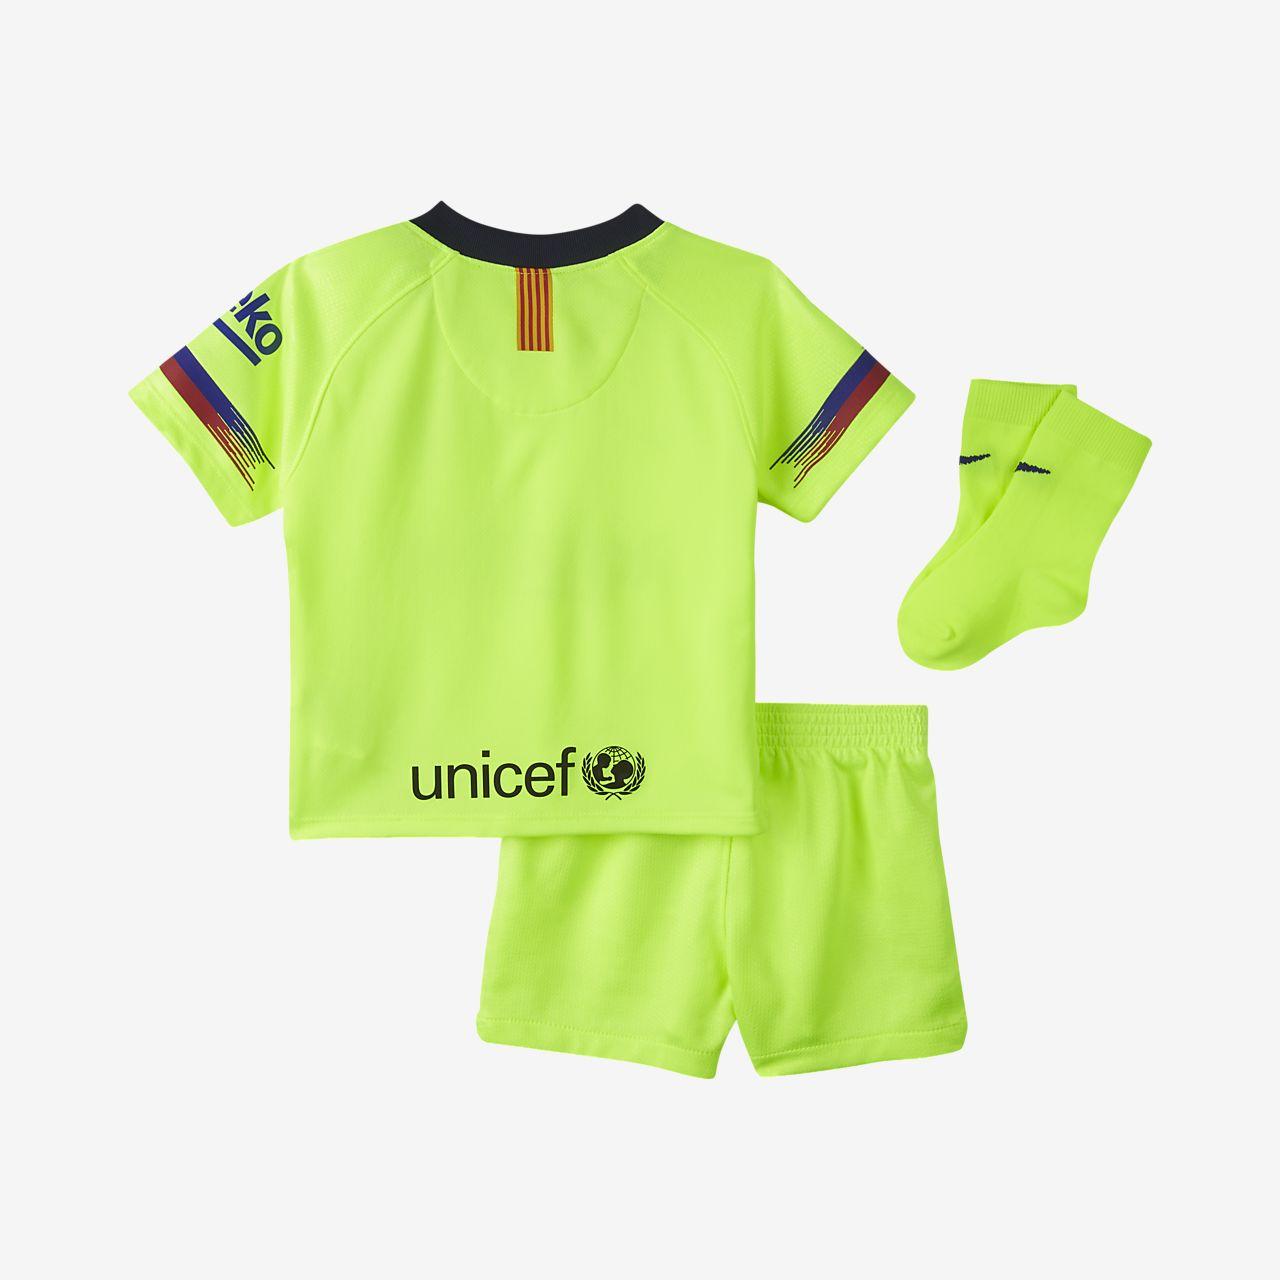 675d13eb8 2018 19 FC Barcelona Stadium Away Baby  amp  Toddler Football Kit ...